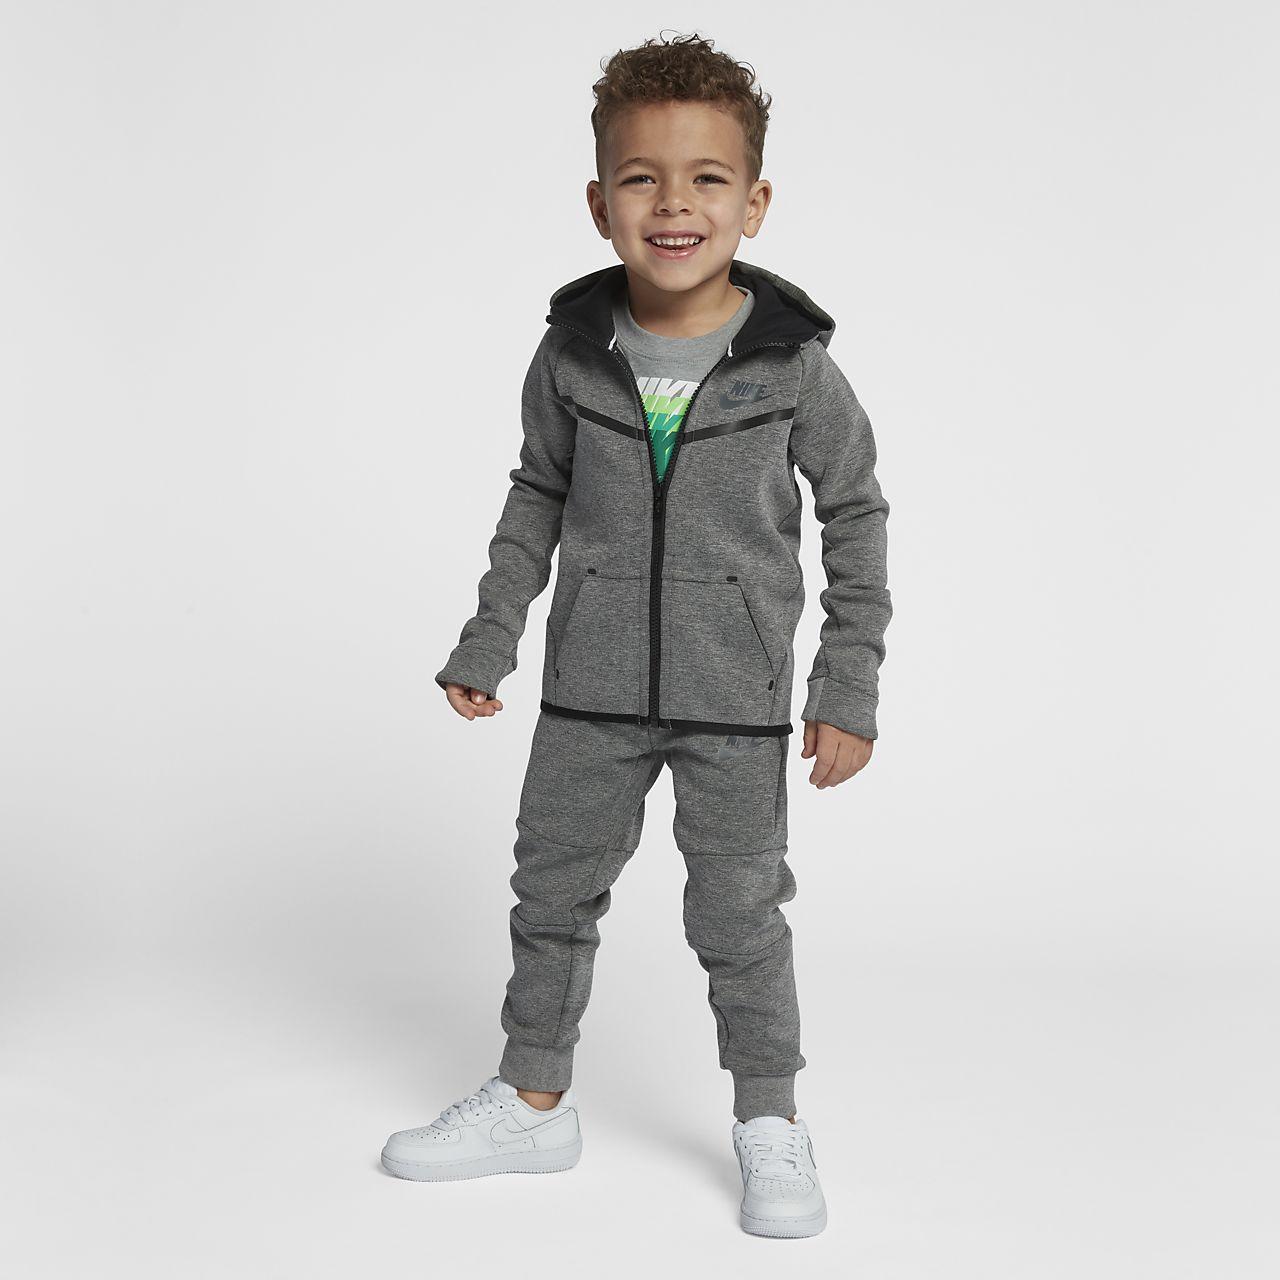 79d6ed838ff5 Nike Tech Fleece Toddler 2-Piece Set. Nike.com